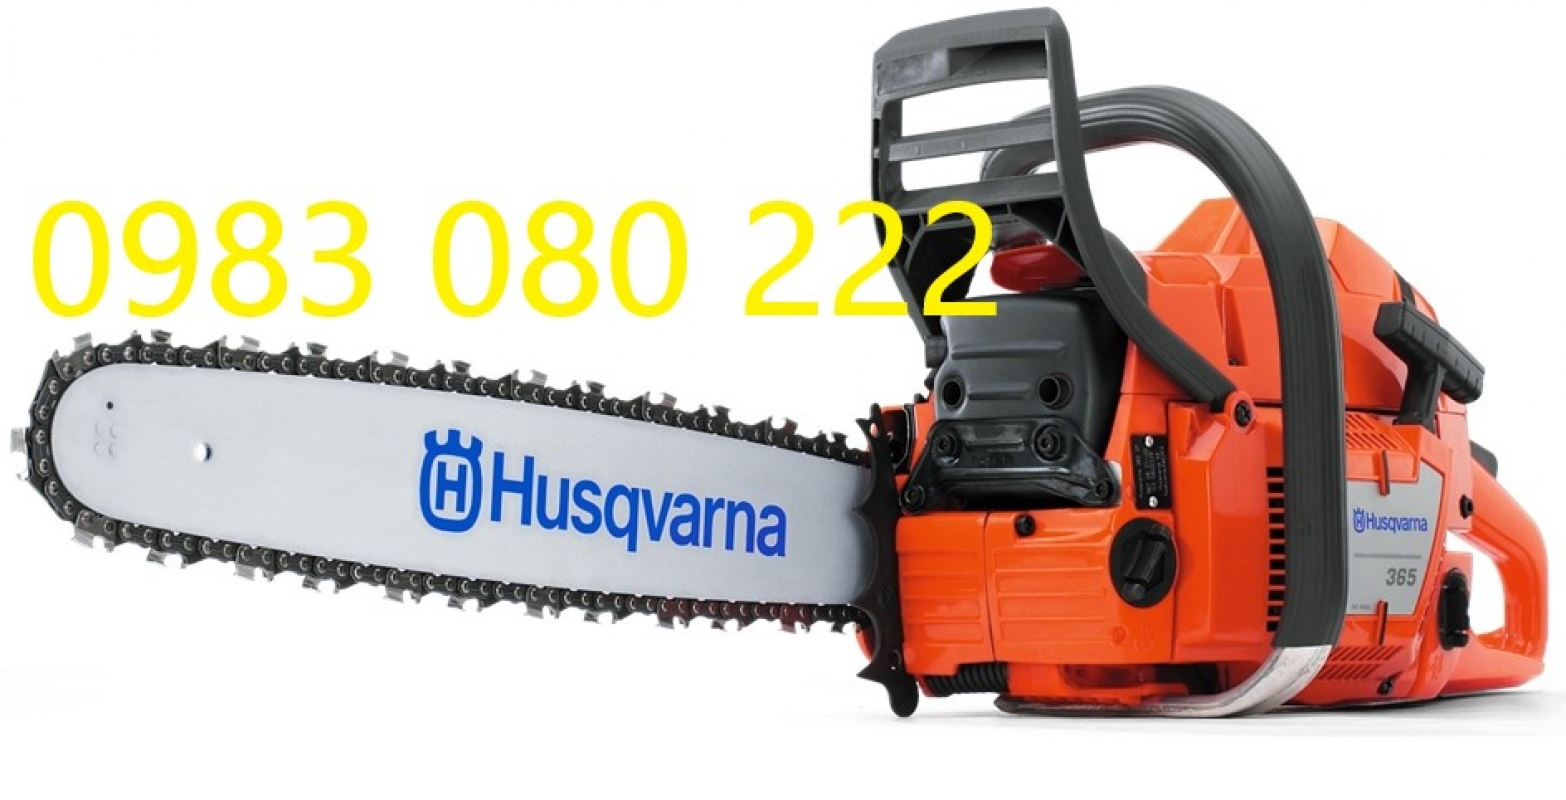 Cưa xích Husqvarna 365 (3.4KW)